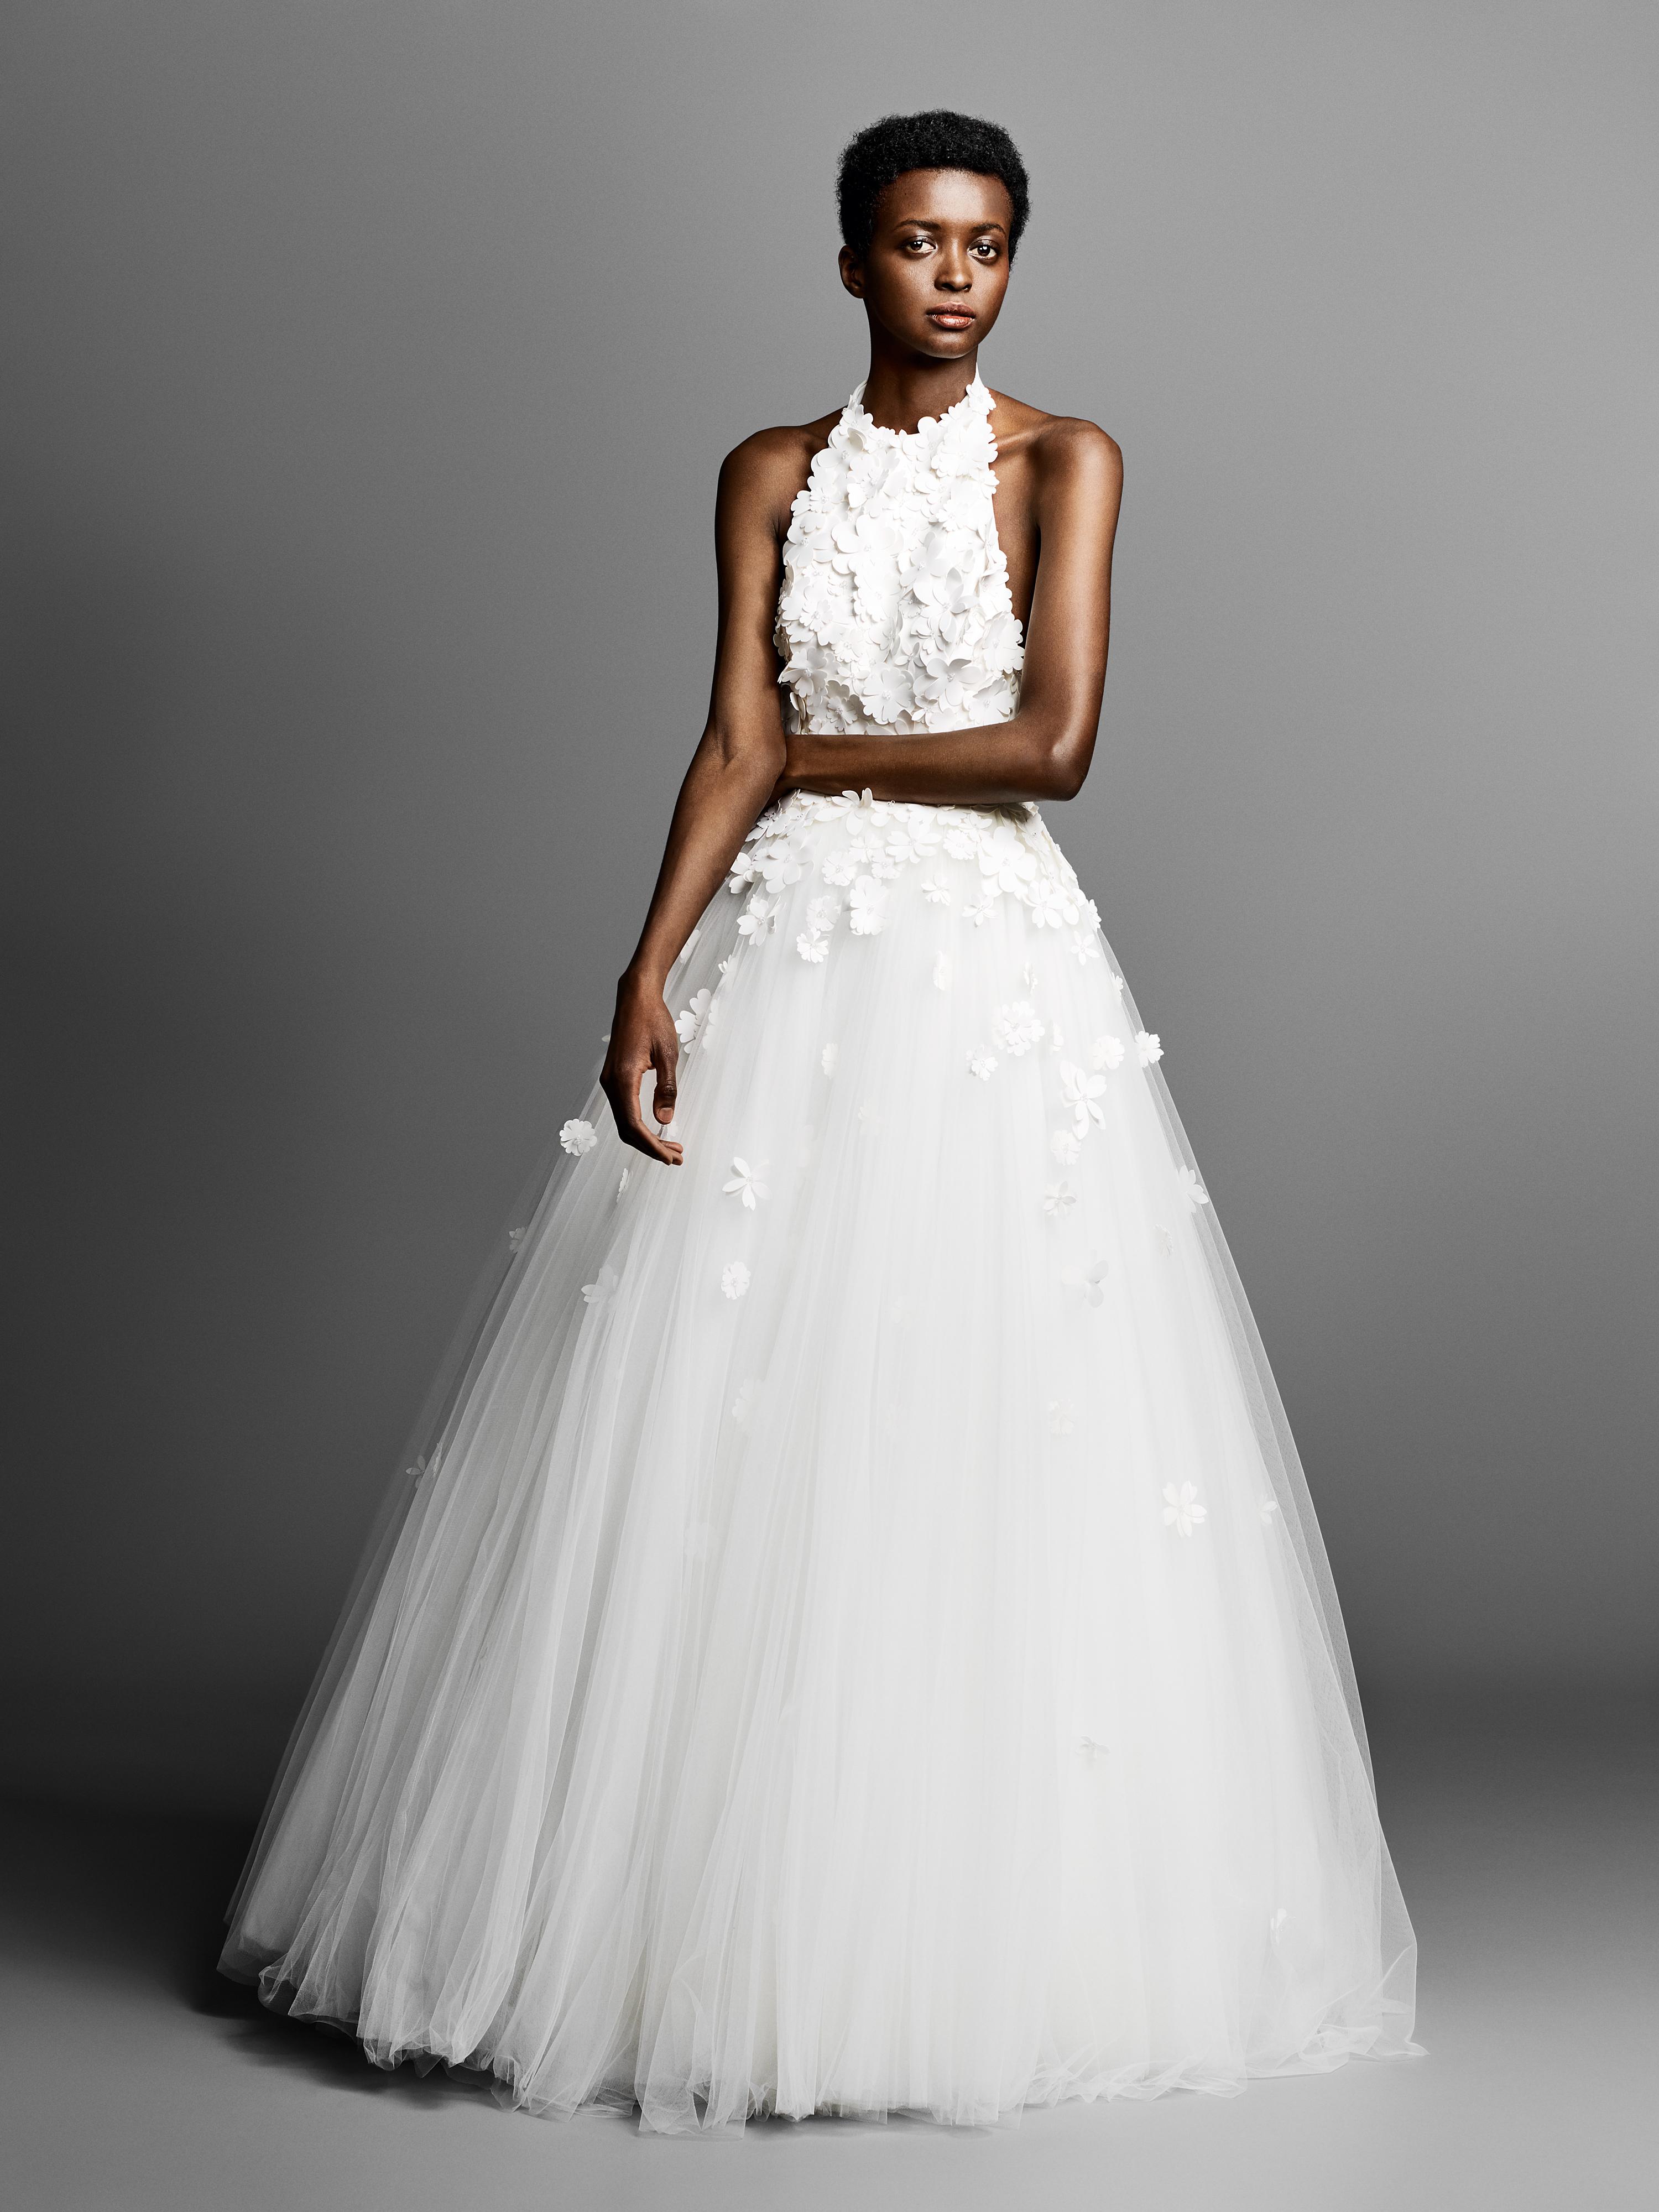 viktor rolf a-line wedding dress with halter neckline spring 2019